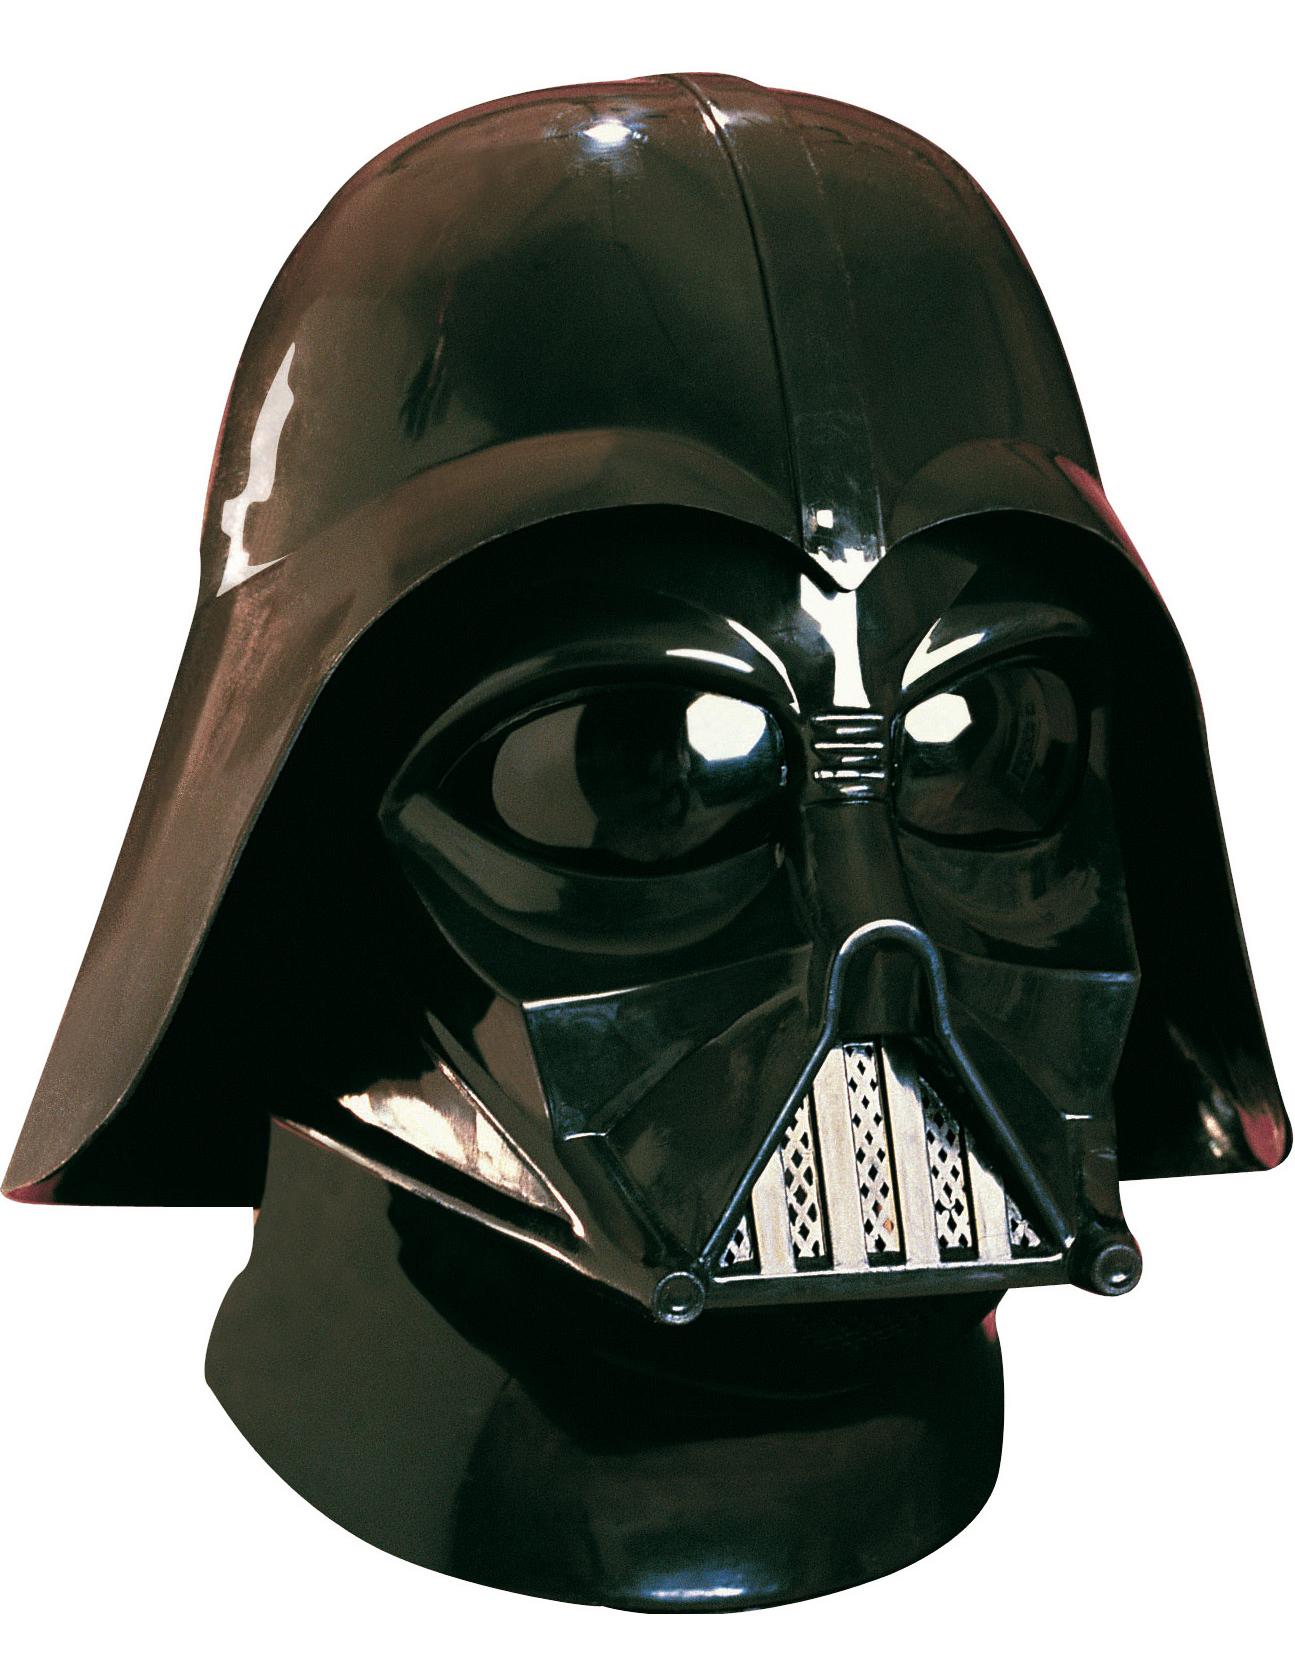 Citaten Uit Star Wars : Delig masker van darth vader™ uit star wars™